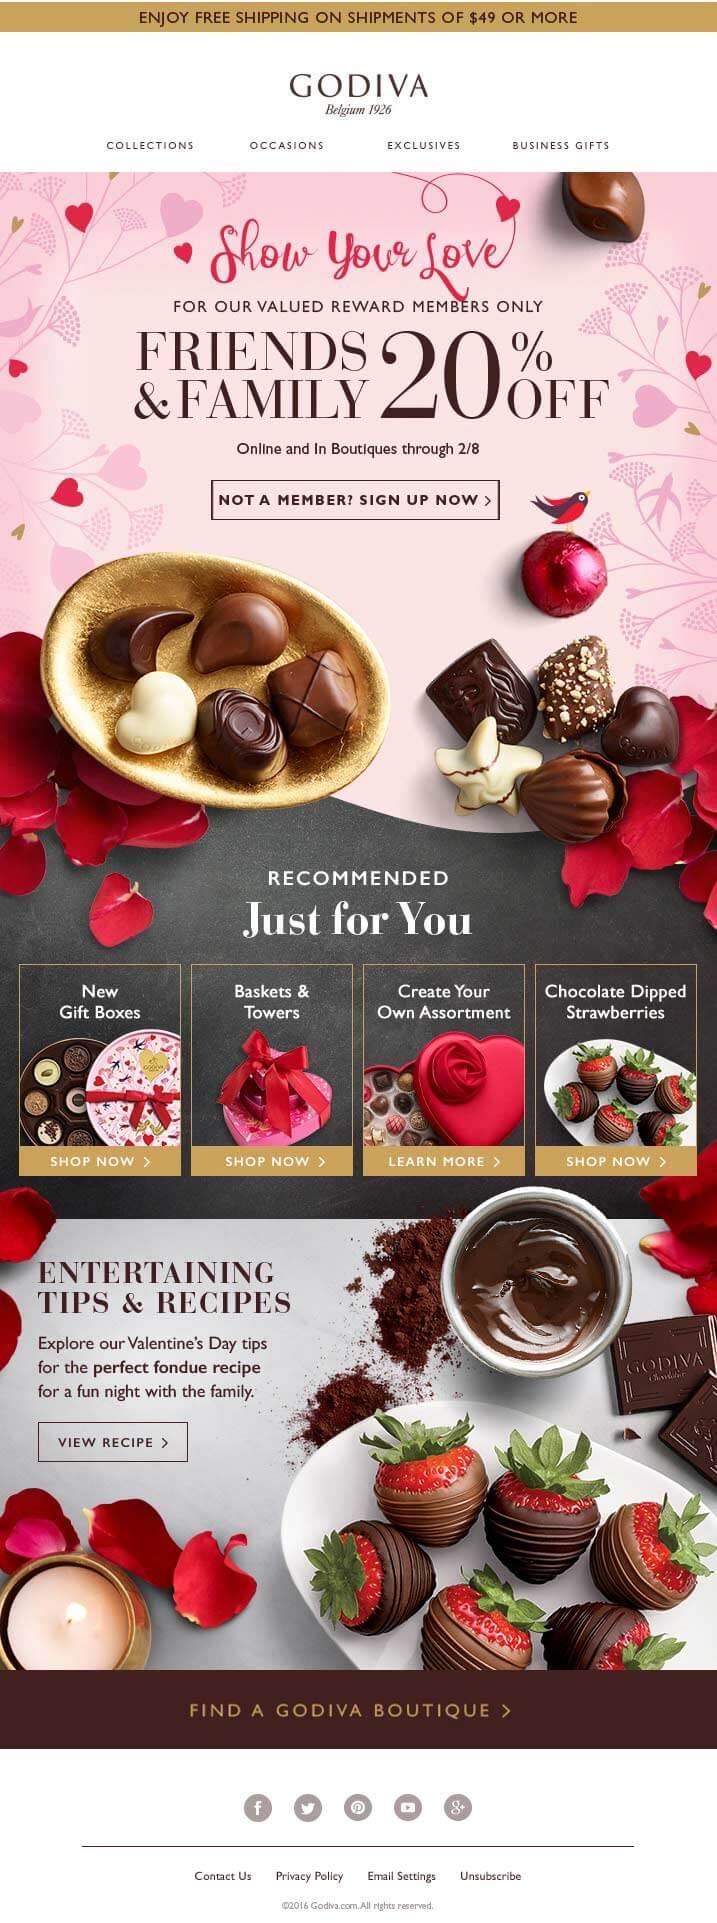 GODIVA-Valentine's Day